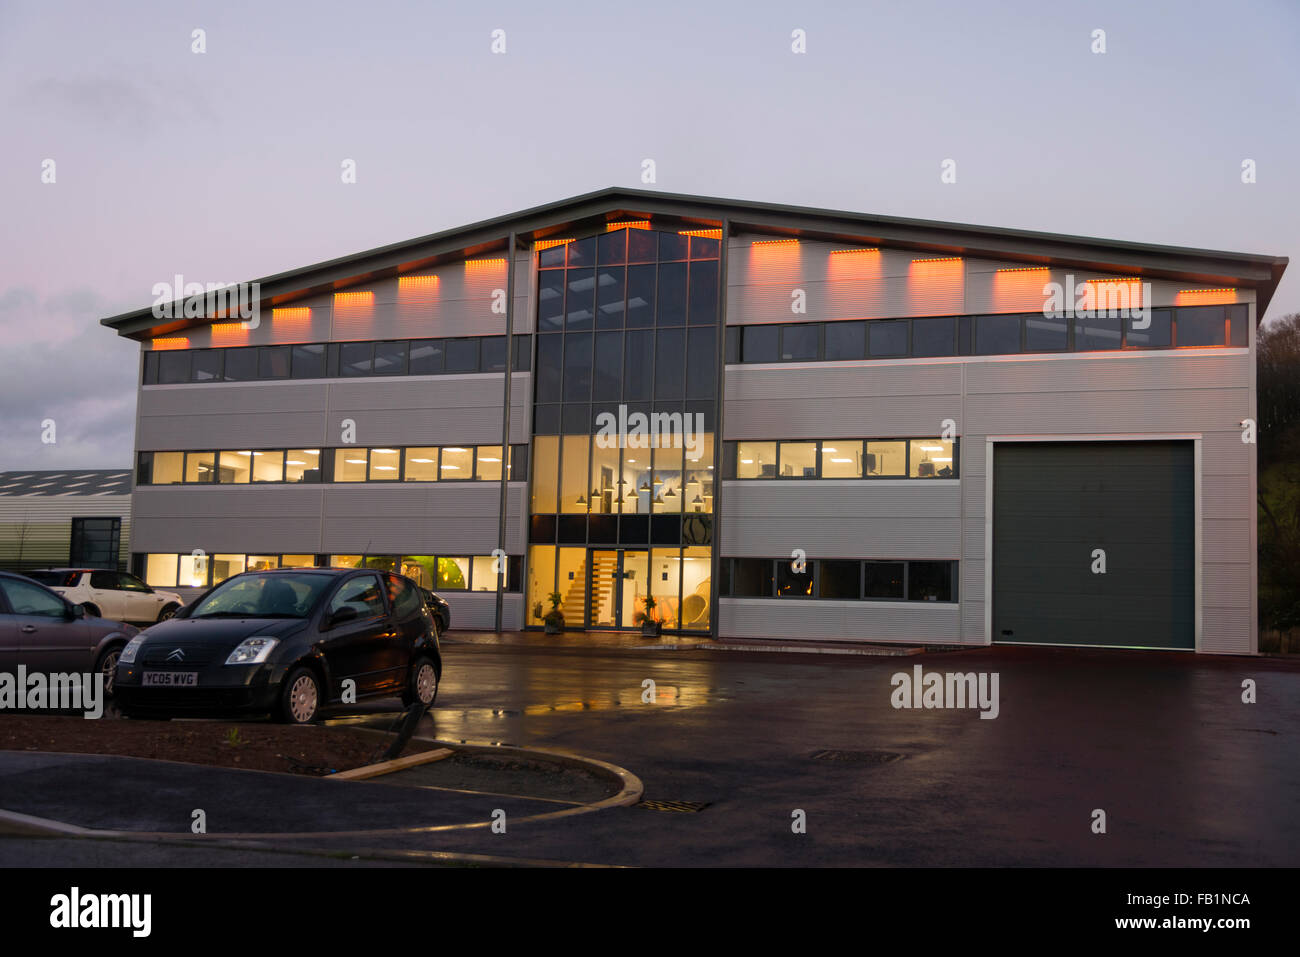 Commercial real estate industrial unit exterior taken at dusk, UK. - Stock Image